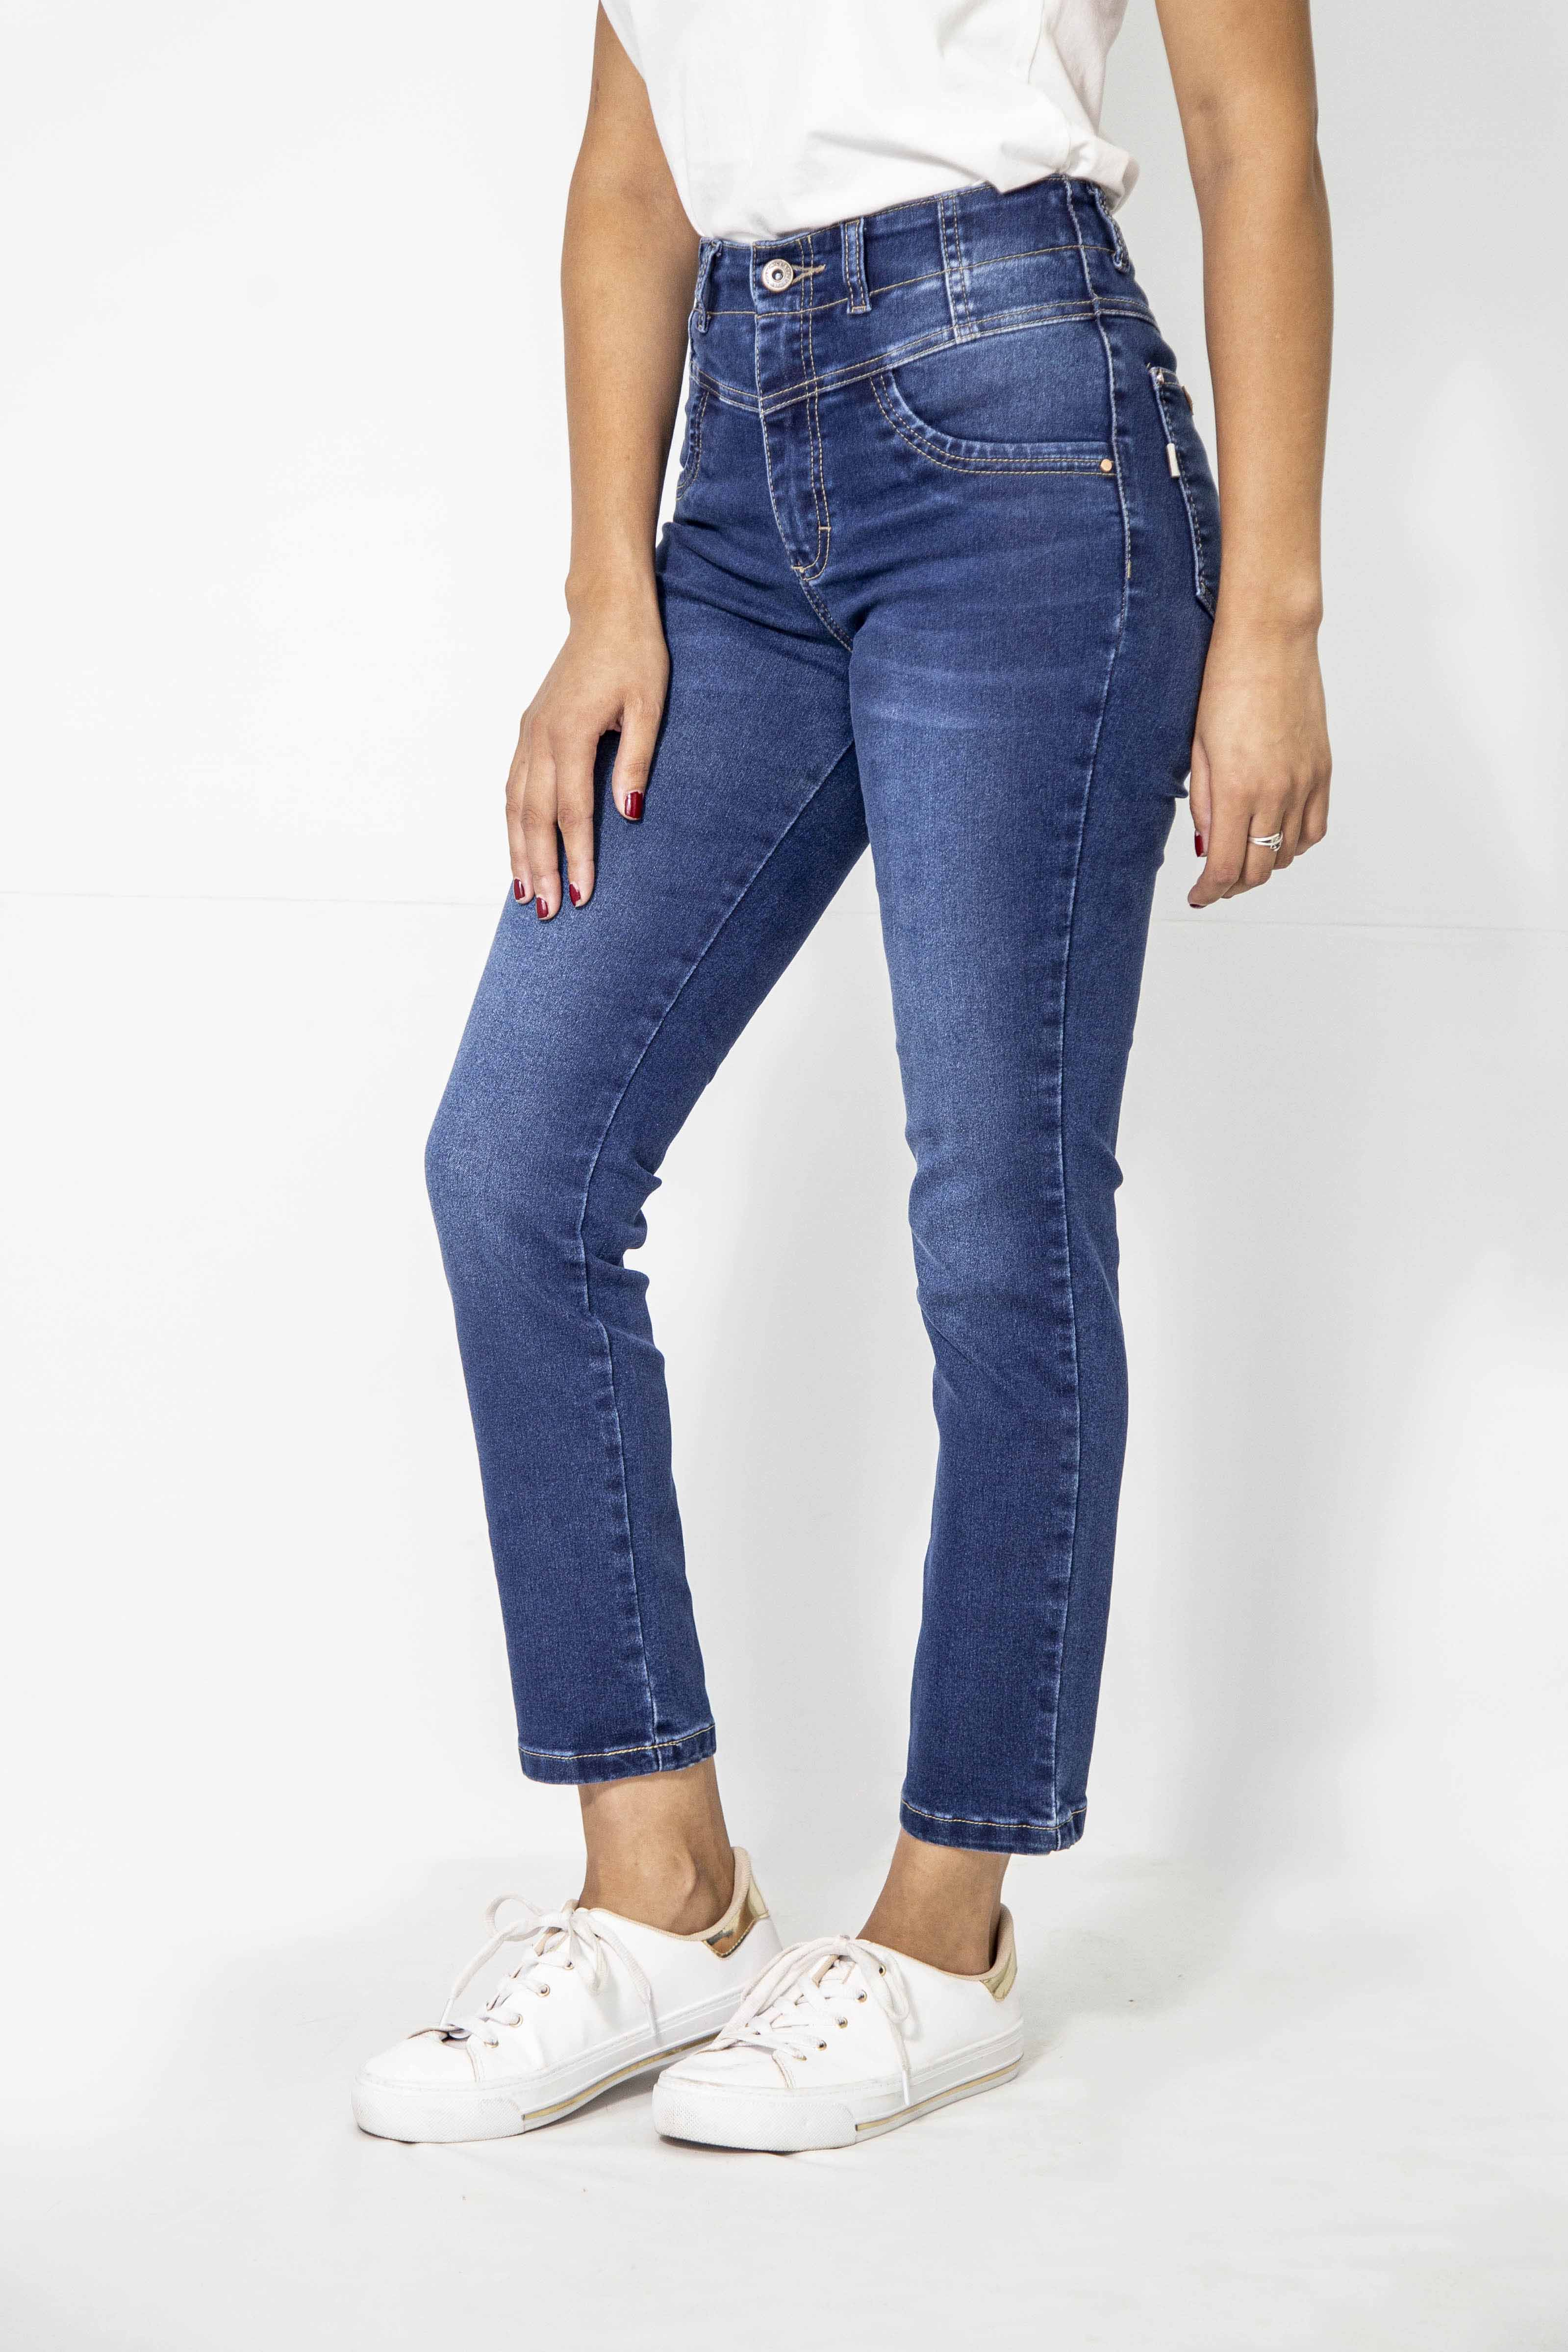 Cropped Dama Jeans Elast. Cod. 1190652